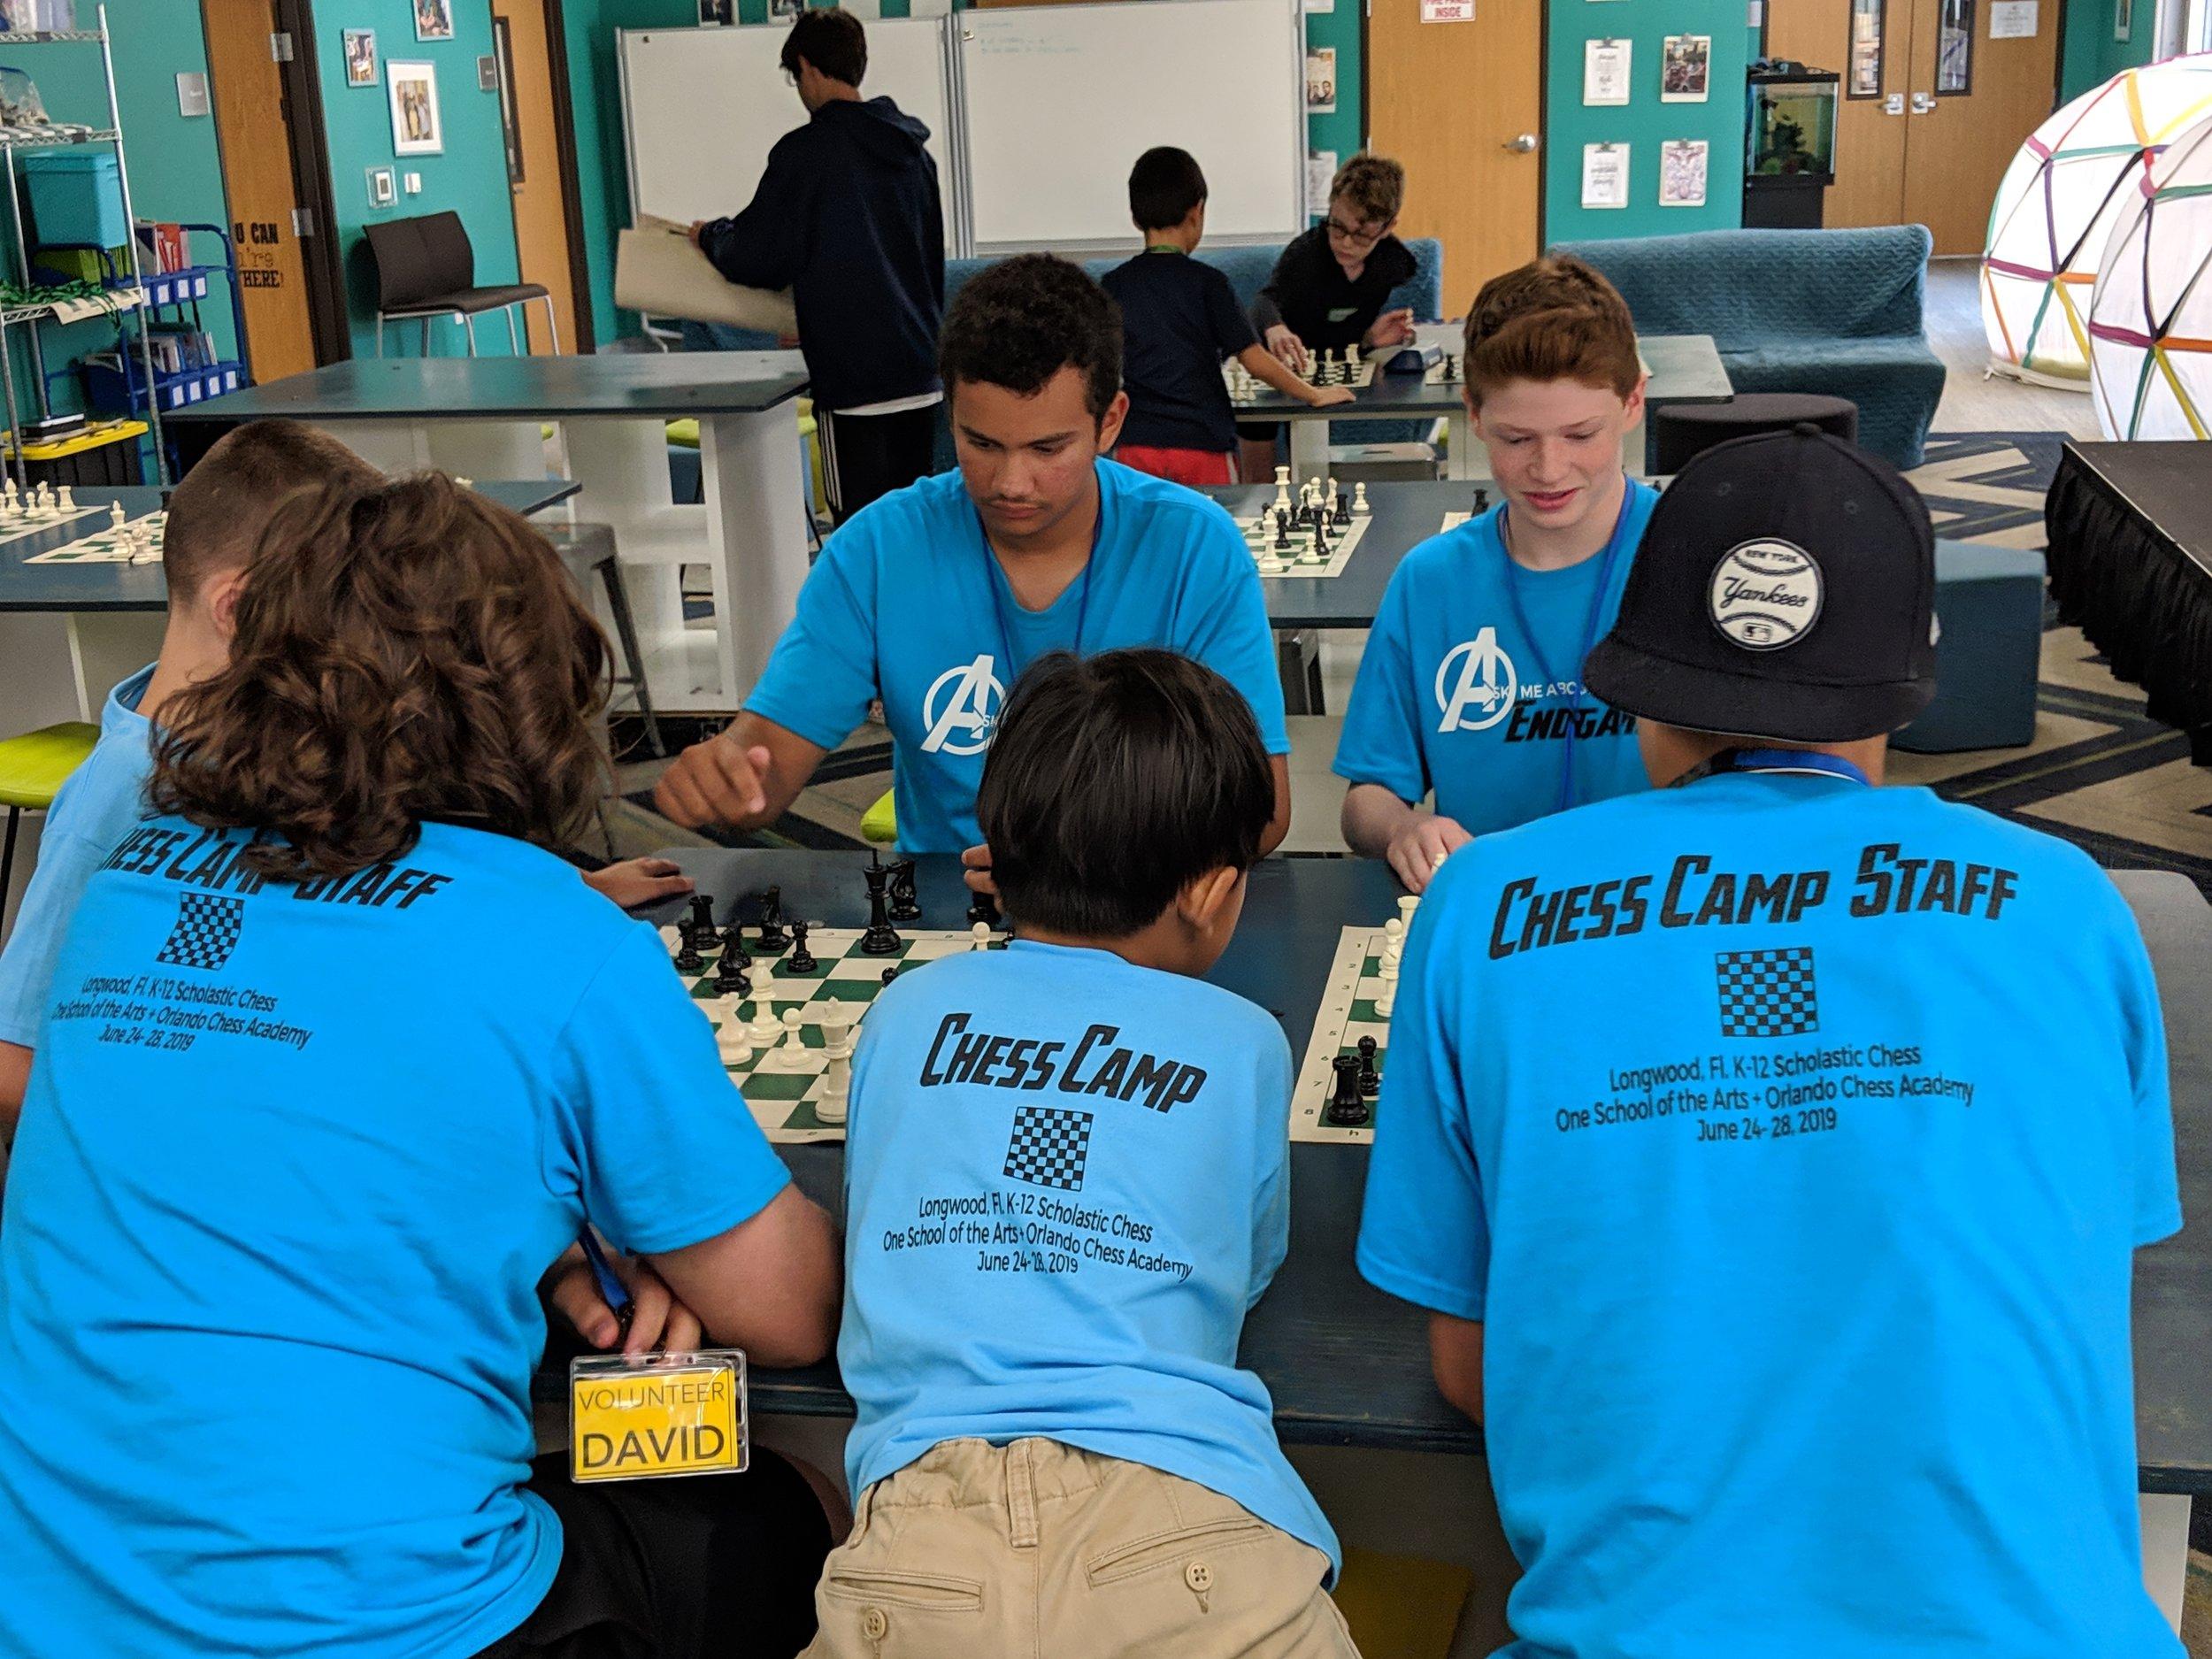 Orlando Scholastic Chess Club — One School of The Arts